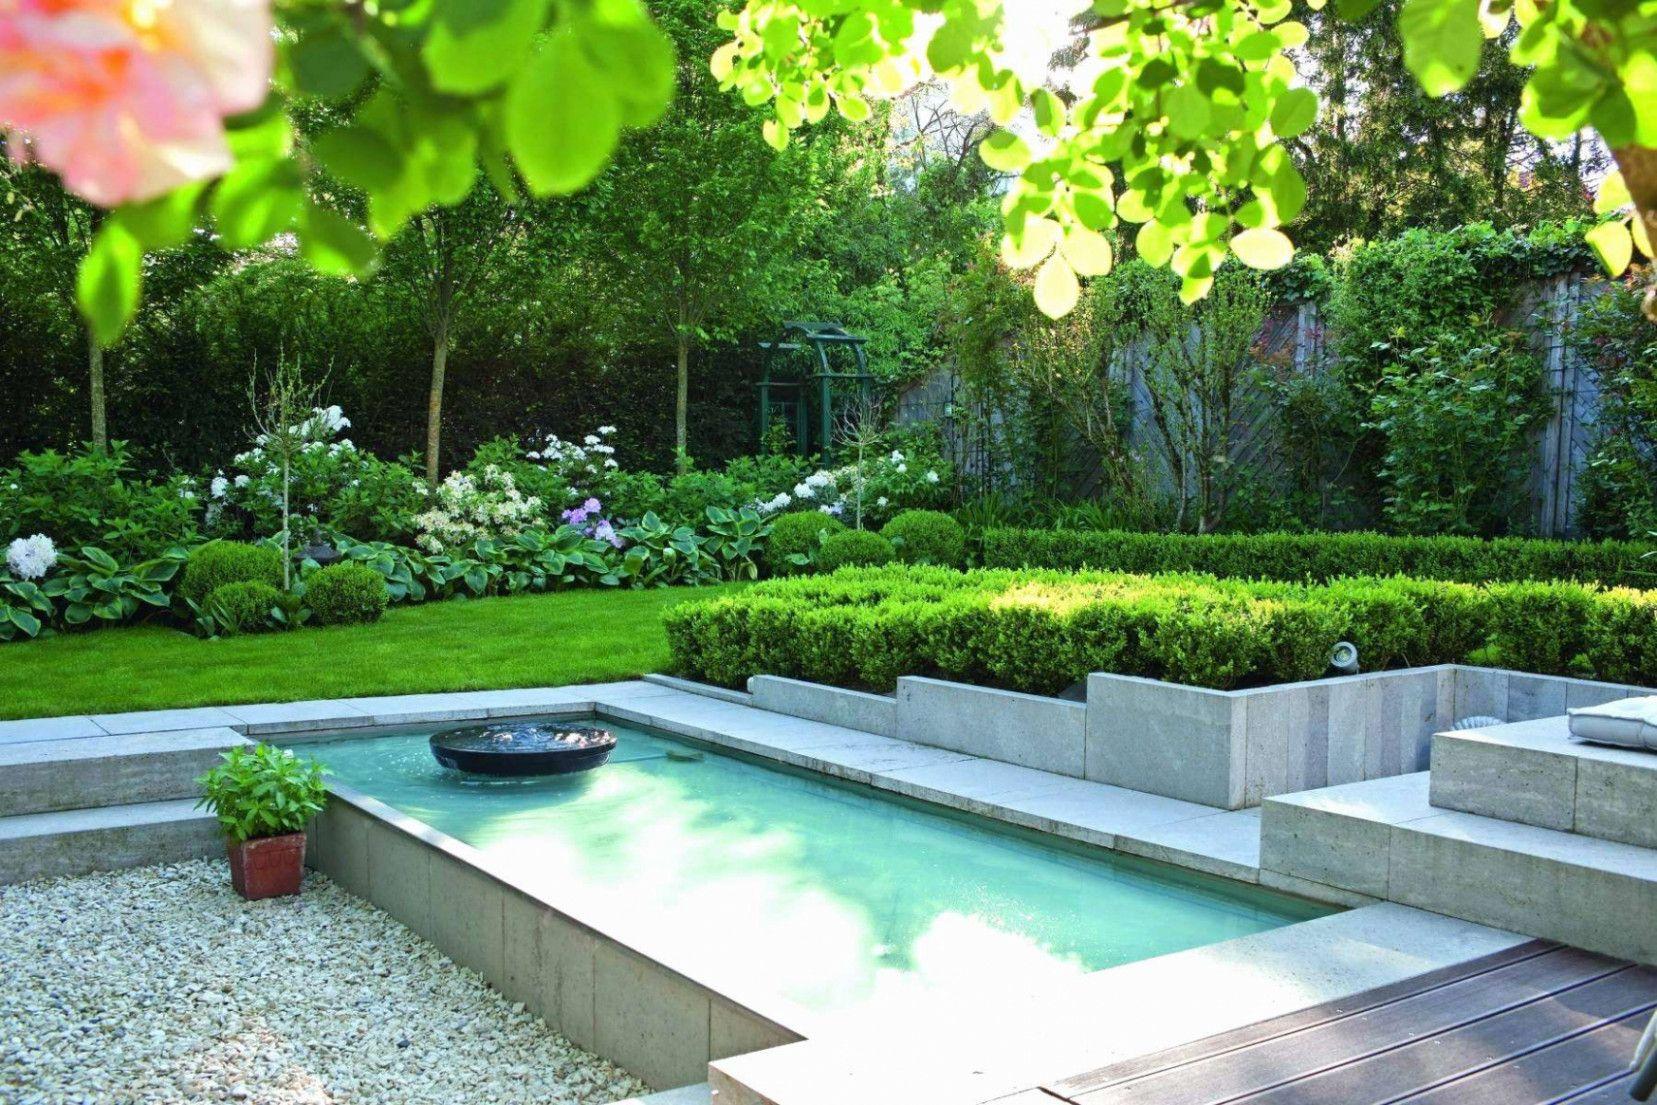 Garten Schon Gestalten In 2021 Pool Landscape Design Backyard Landscaping Pool Landscaping Small backyard landscaping ideas with pool